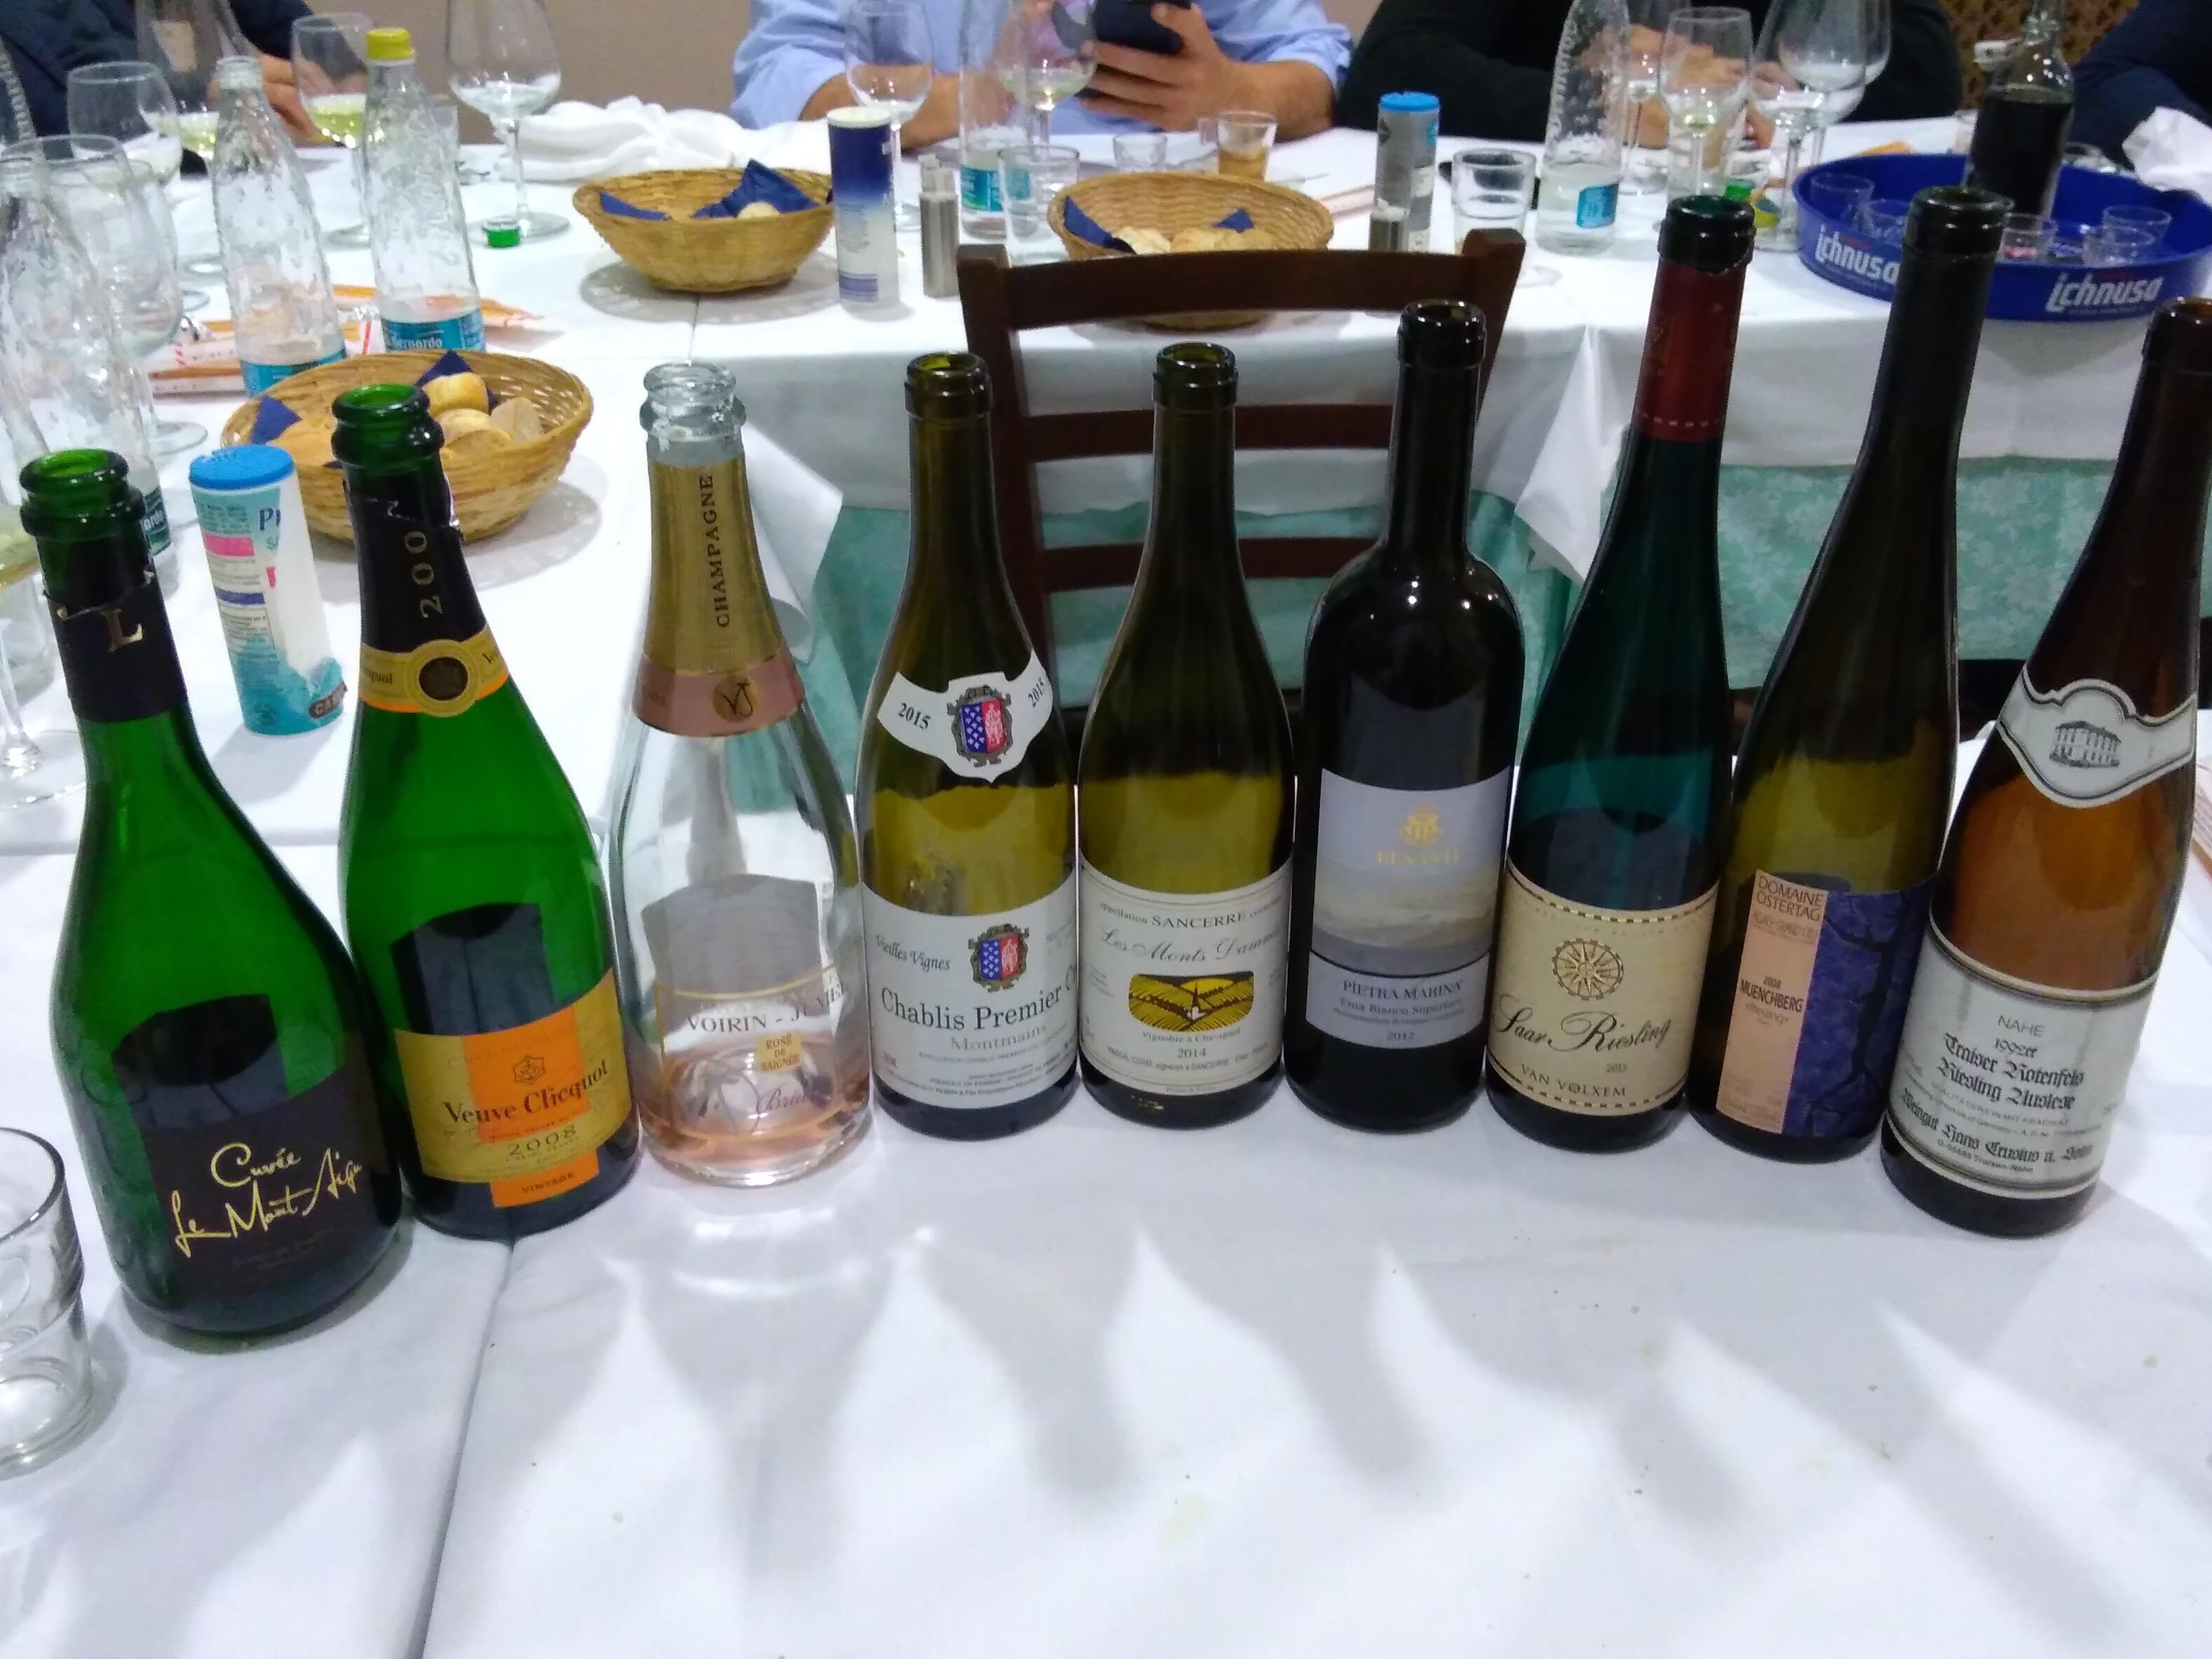 Champagne, riesling e altri bianchi...